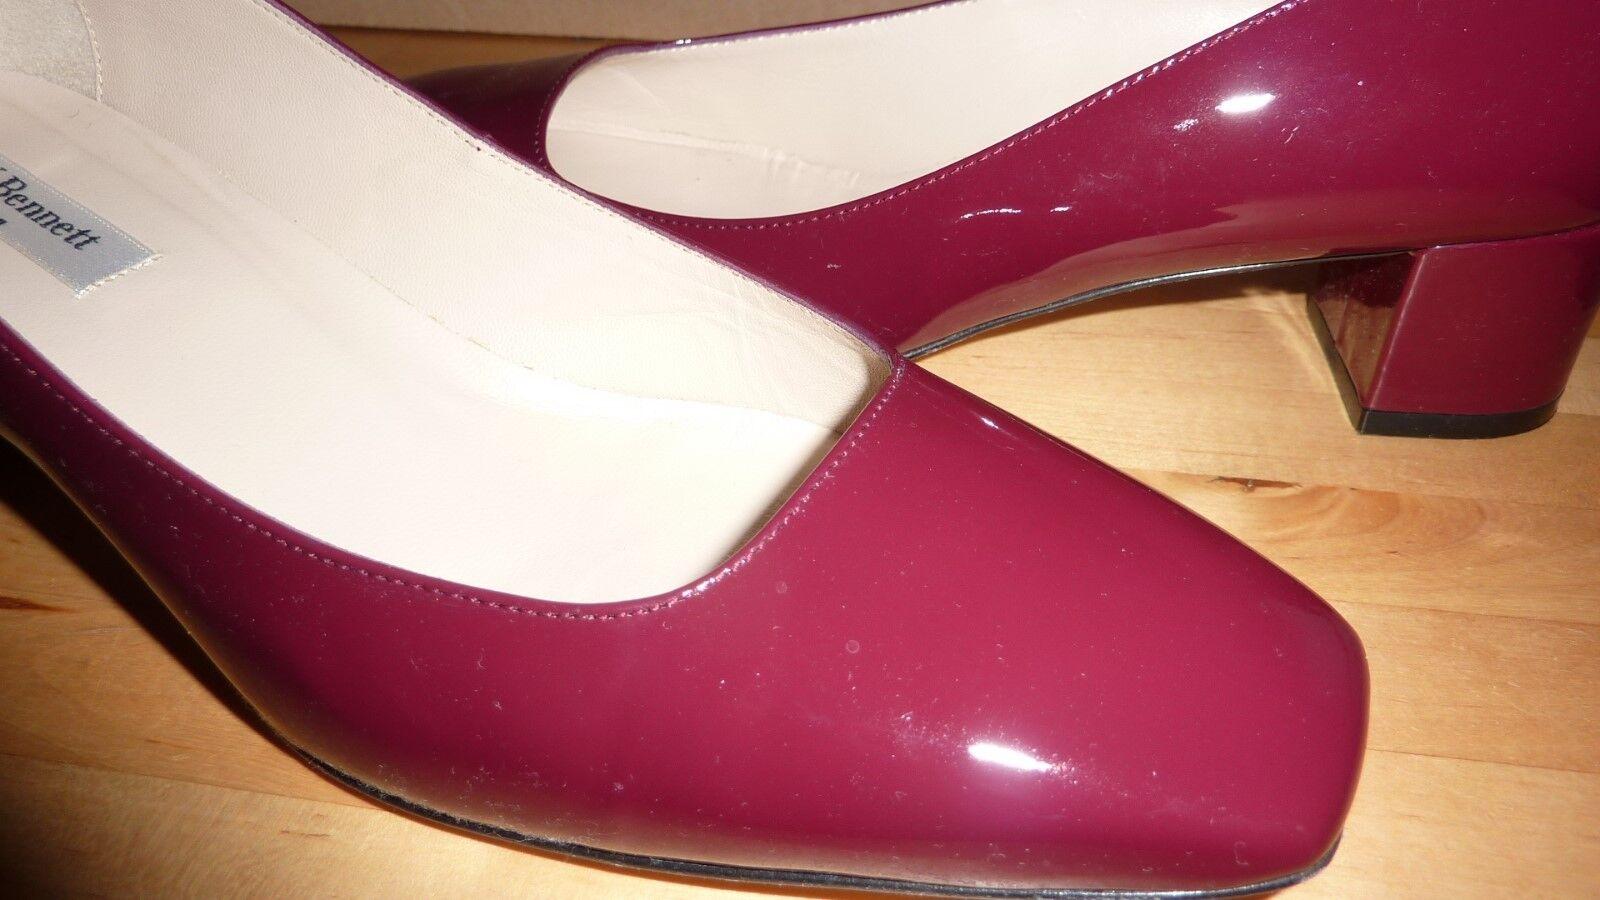 L K LK BENNETT shoes Burgundy Red 40 7 BORDEAUX BERNICE Patent Leather BNIB FAB